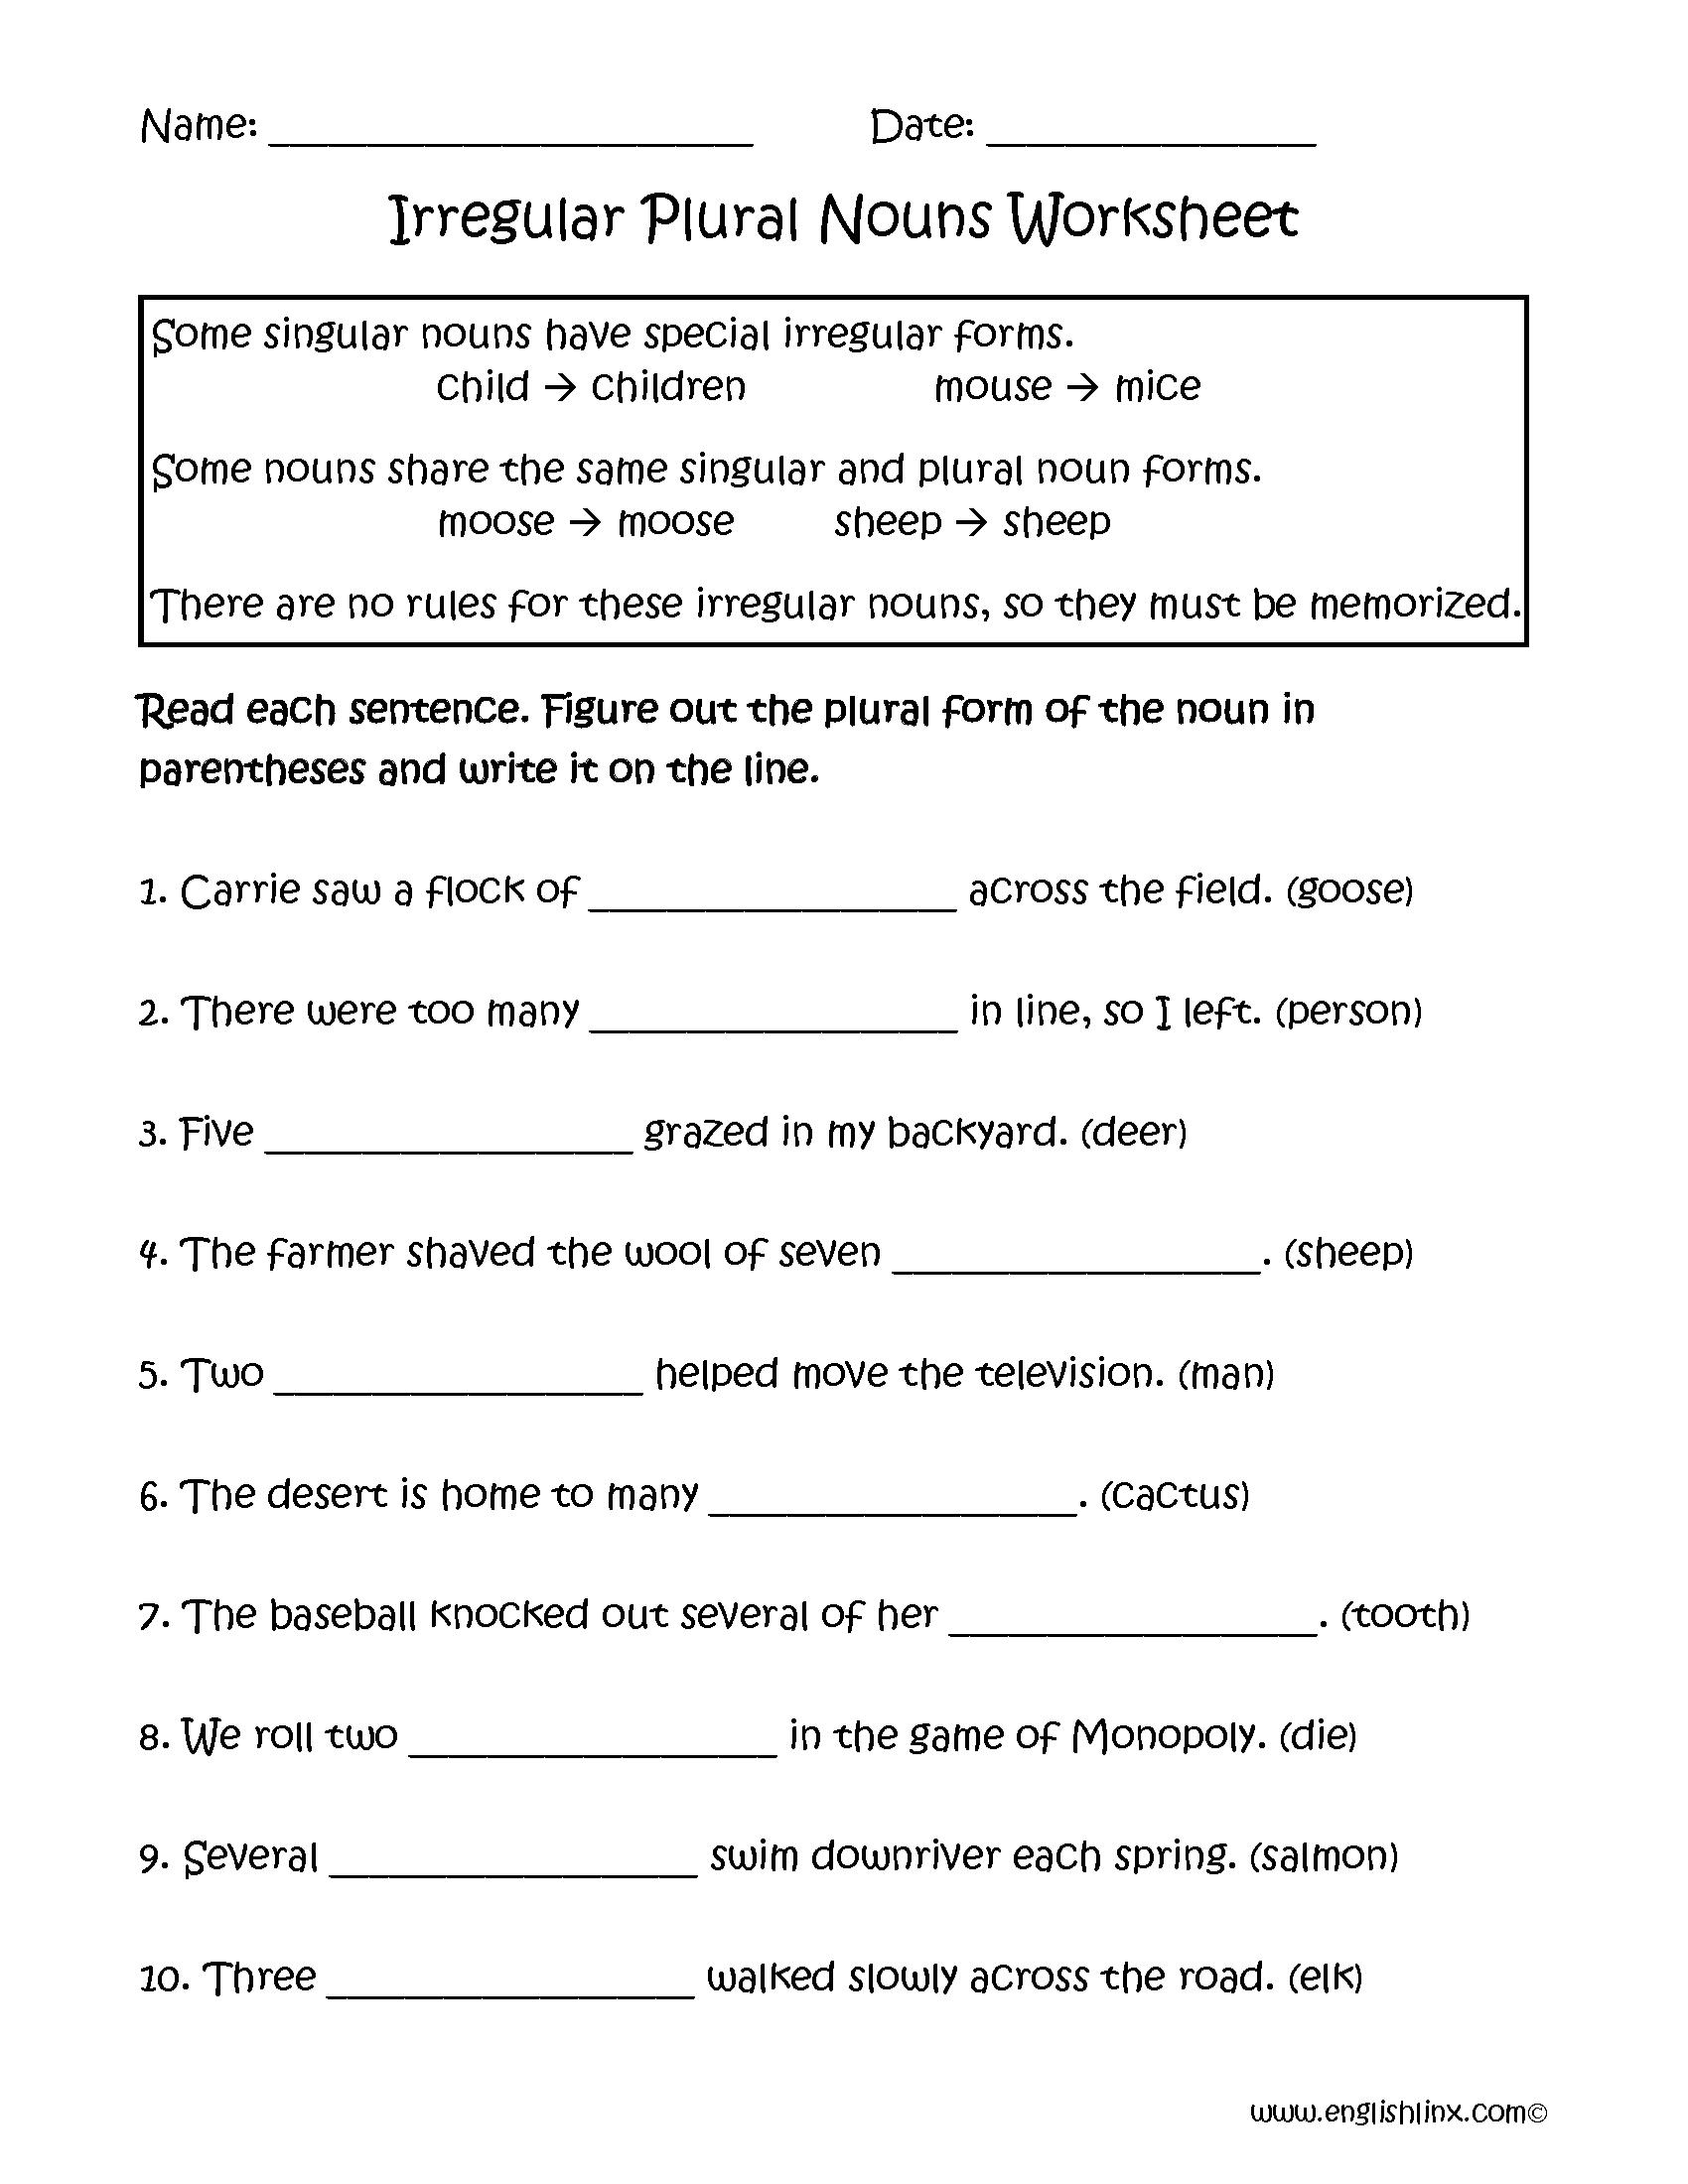 Irregular Nouns Worksheets | Irregular Plural Nouns Worksheets